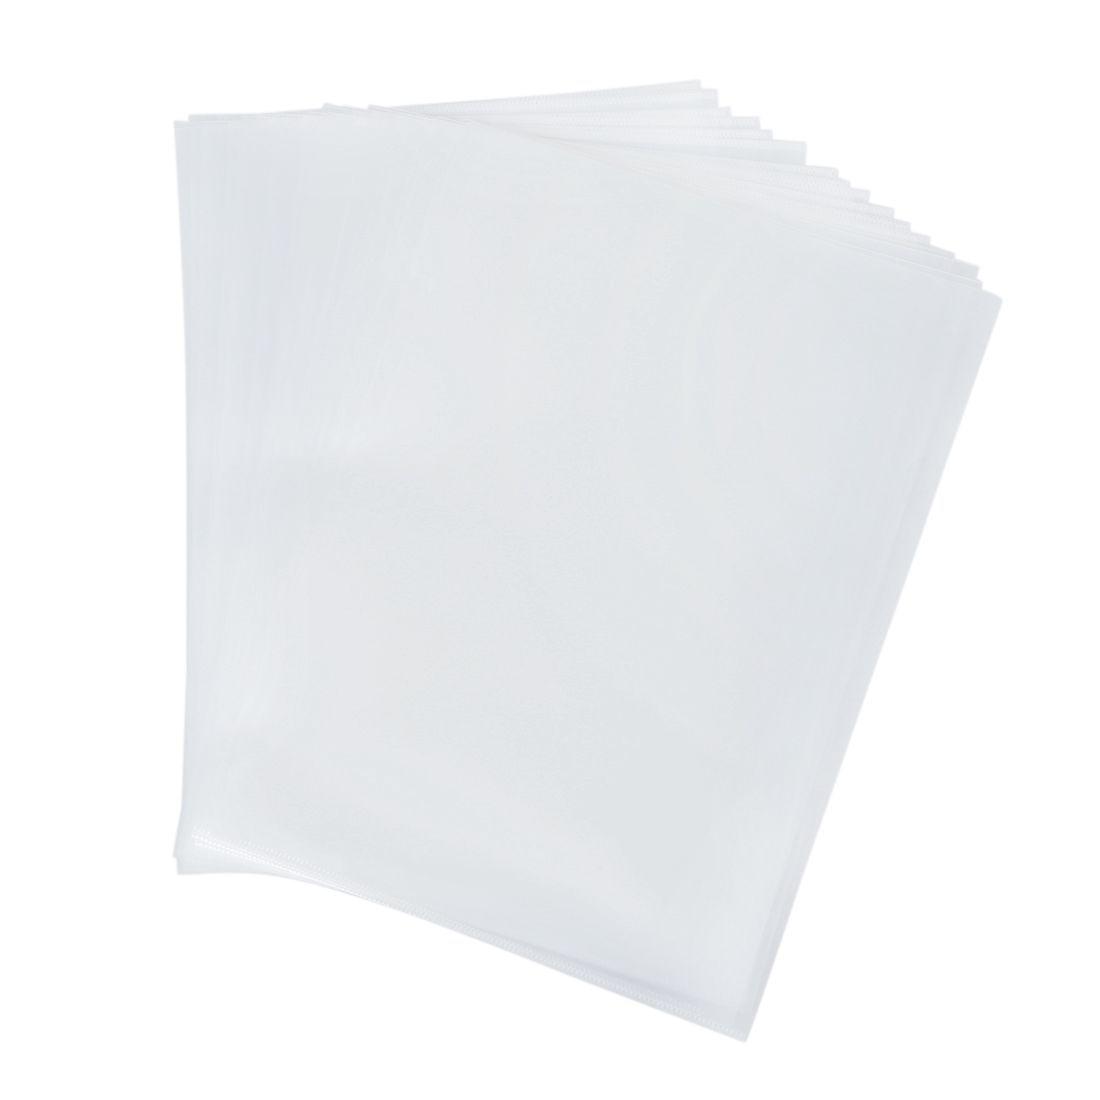 Reusable Clear File Folder Holder for A4 Paper Document 20 PcsReusable Clear File Folder Holder for A4 Paper Document 20 Pcs